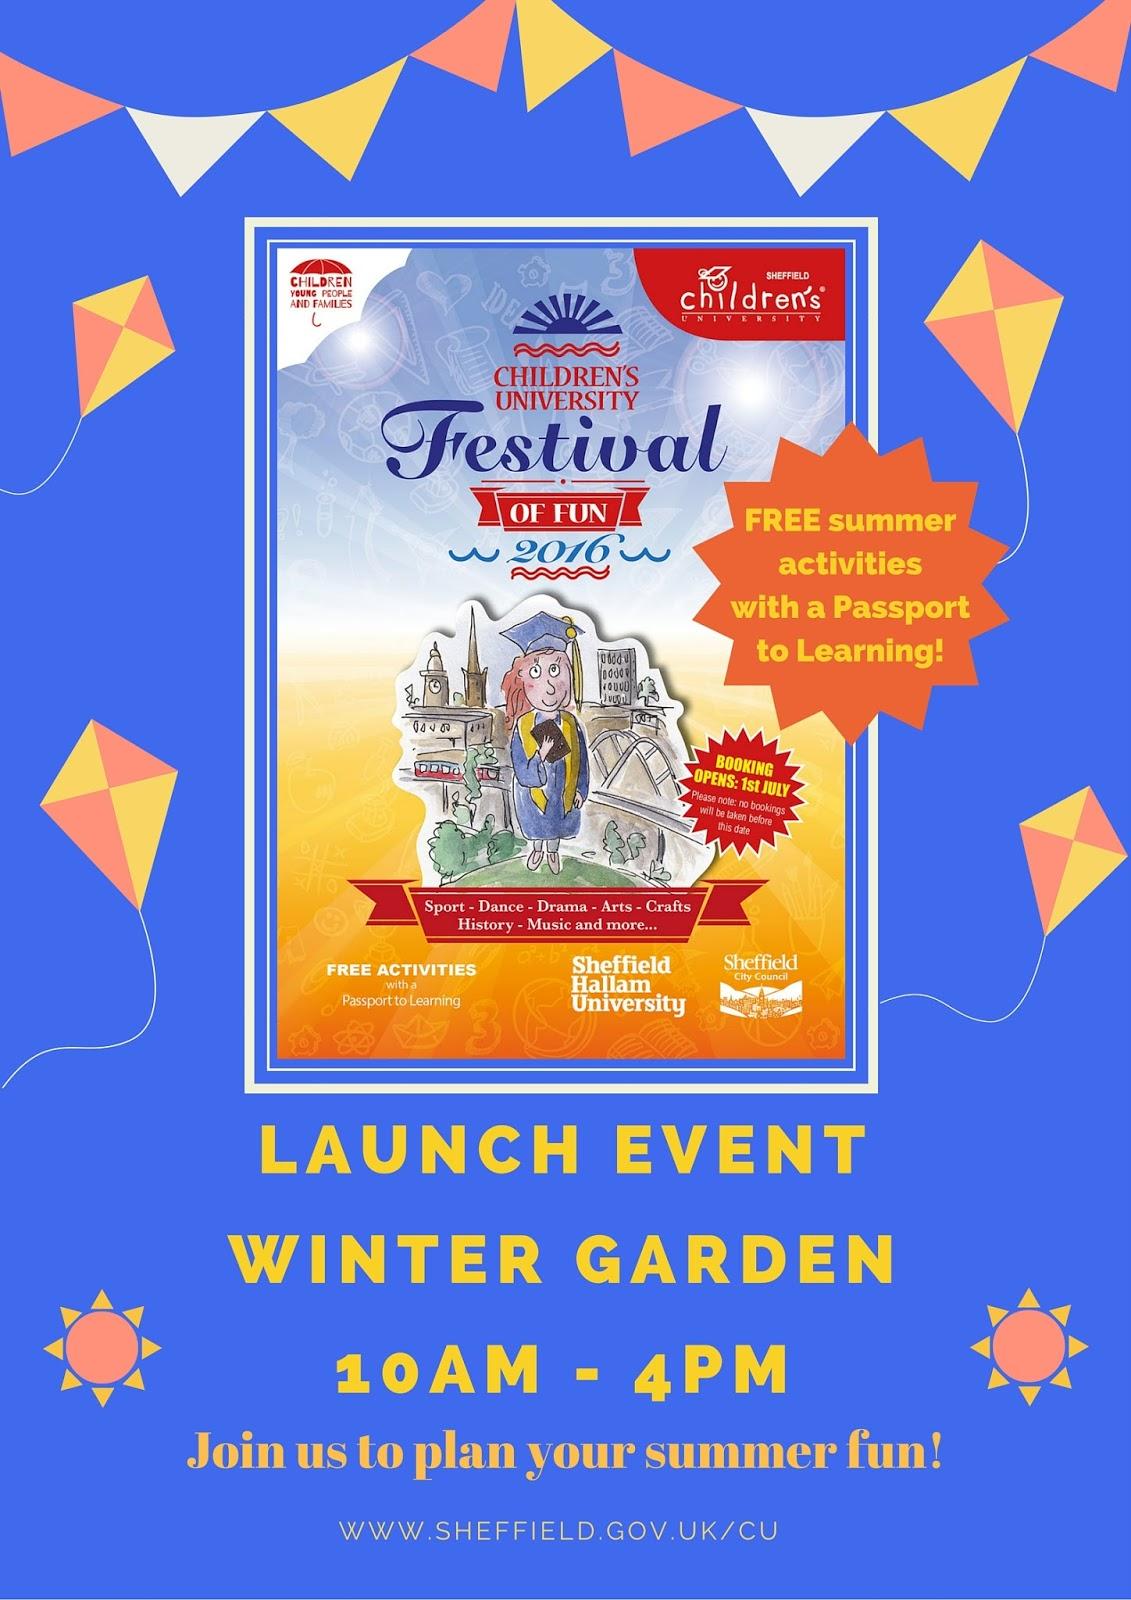 sheffield children u0027s university festival of fun 2016 launch event